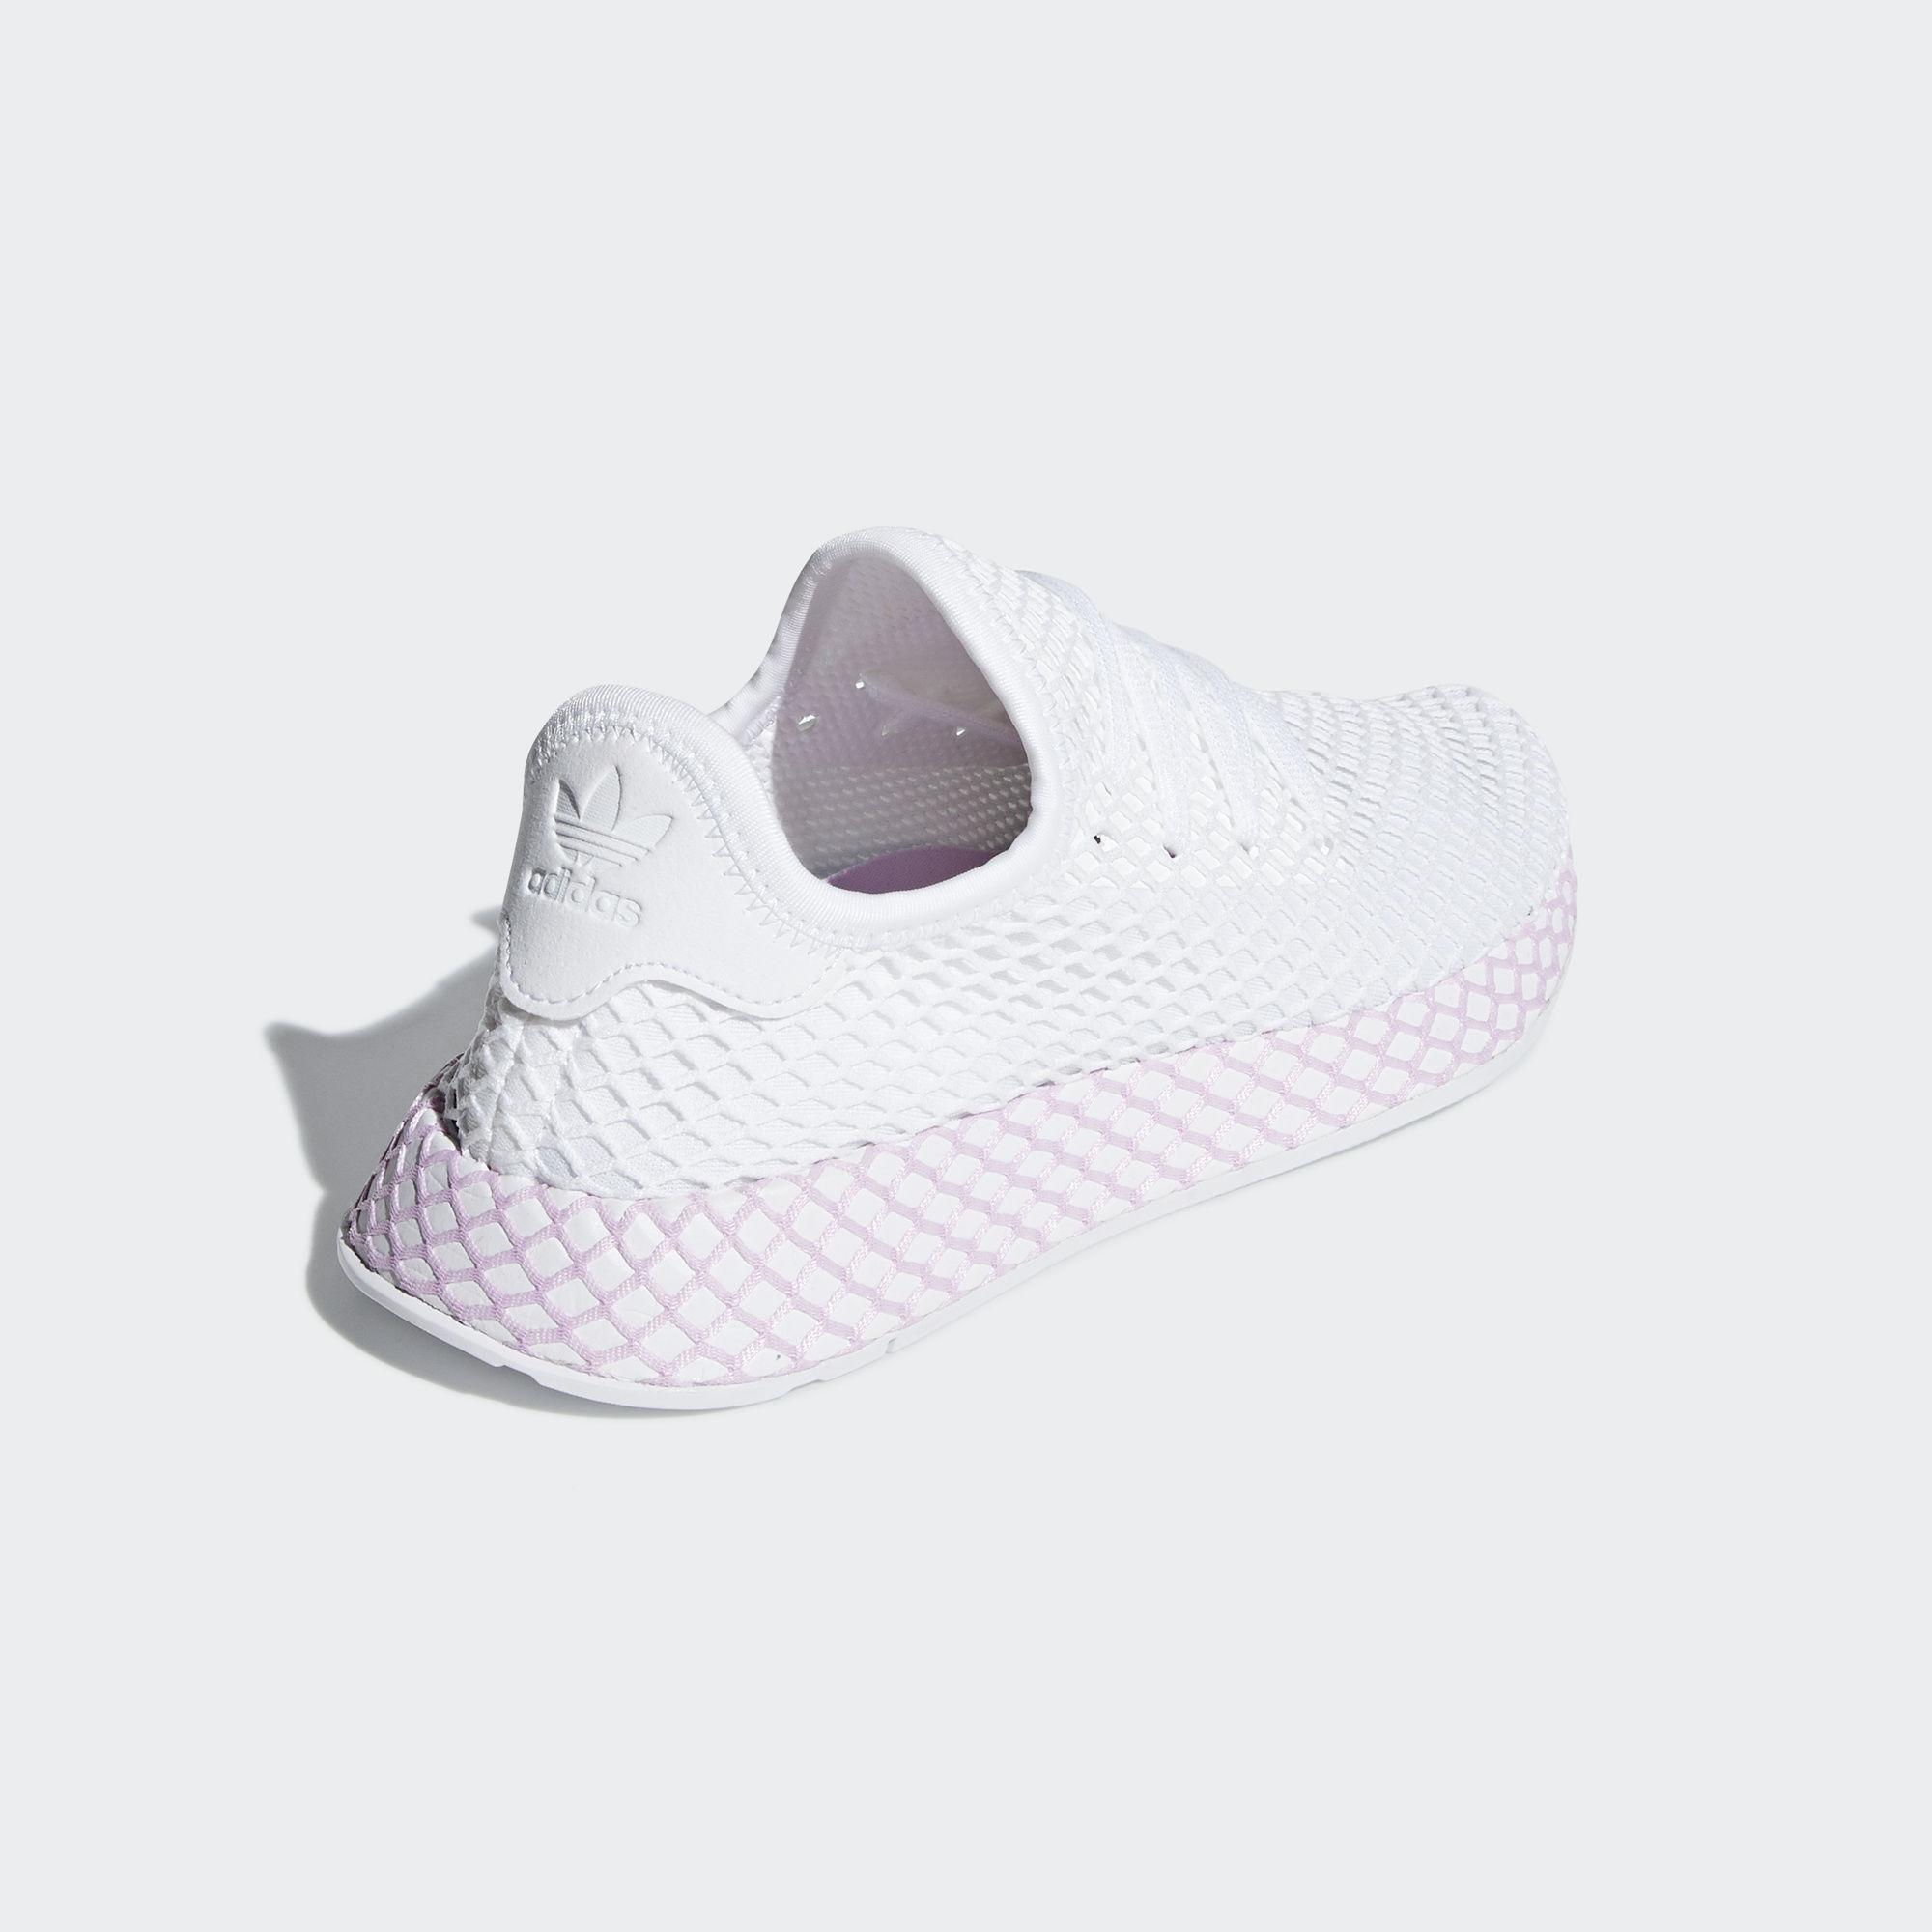 Adidas Deerupt Runner Ftwr White / Clear Lilac (B37601)